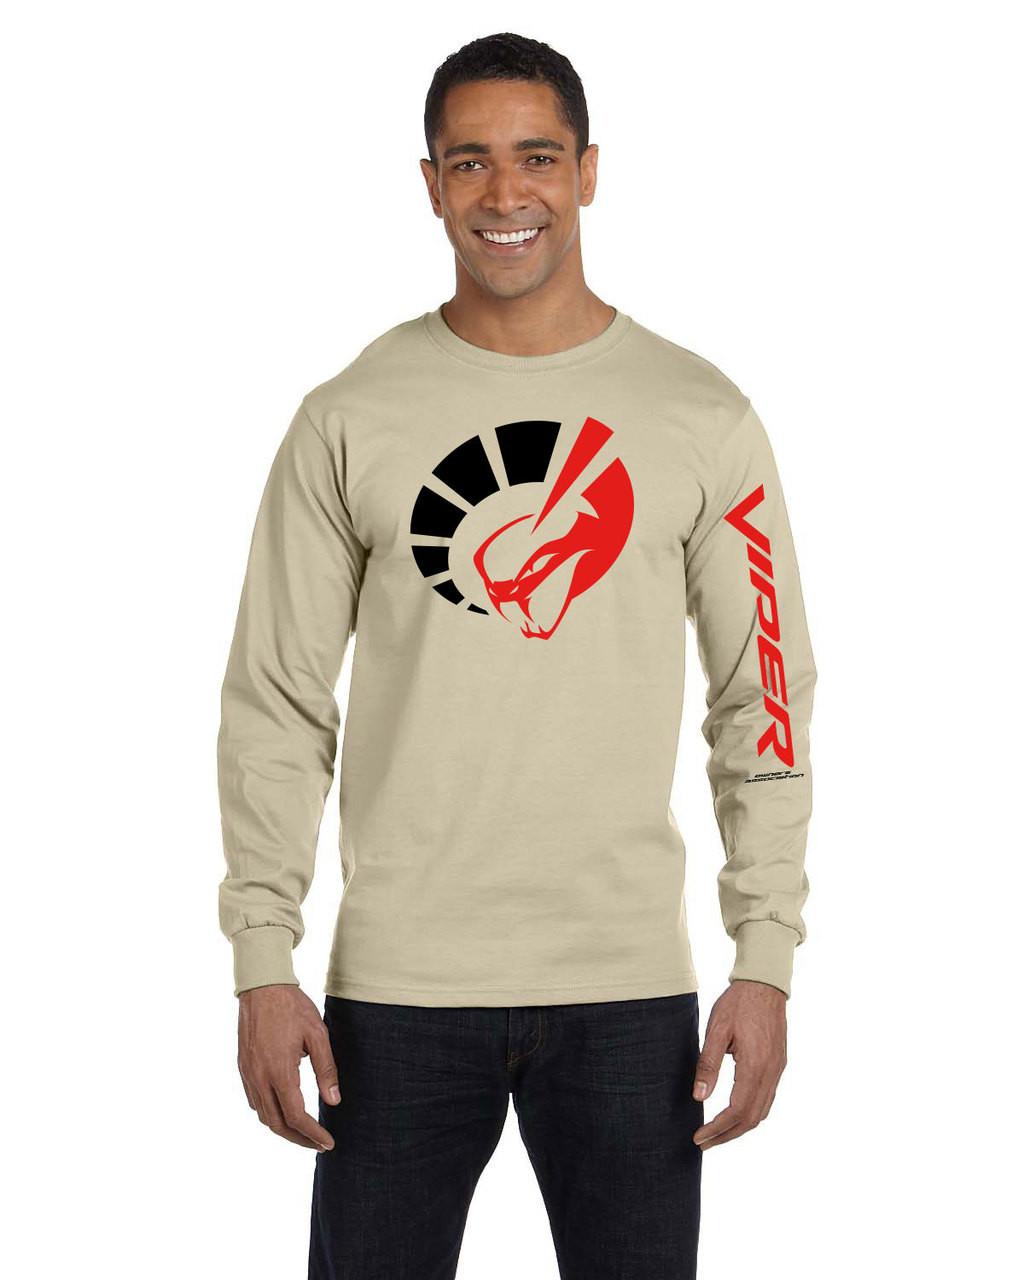 b7239ab470a1aa Hanes Beefy T Long Sleeve T Shirt Wholesale